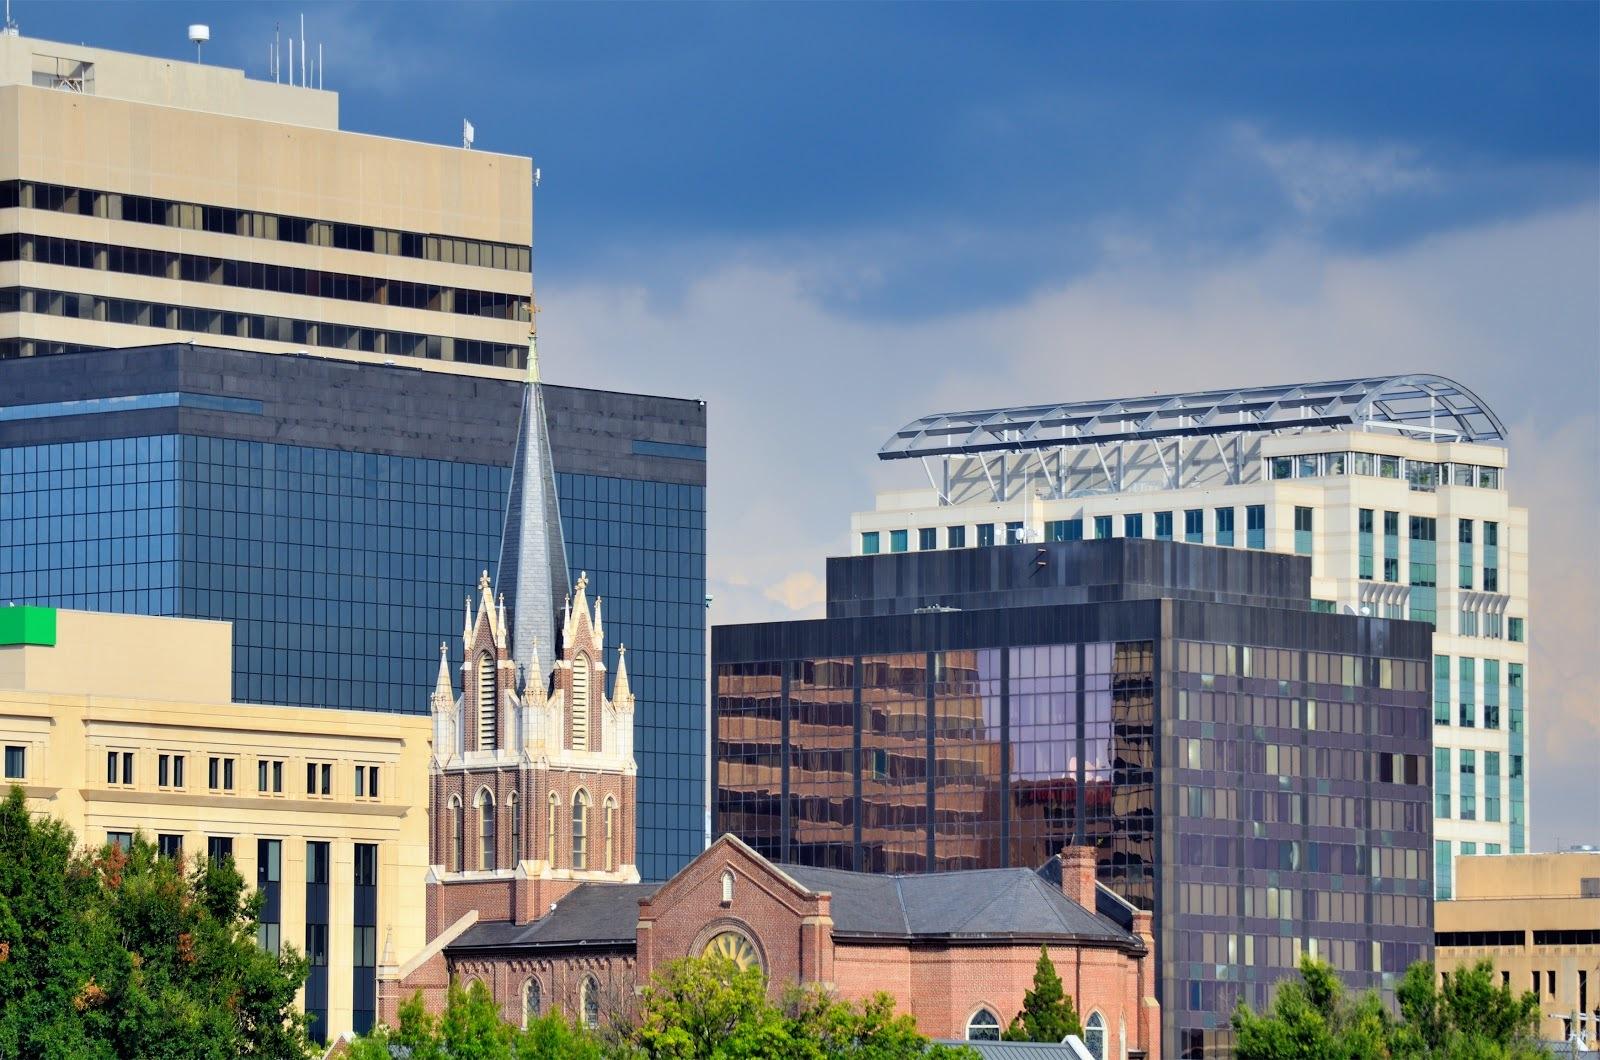 Photo of downtown Columbia, South Carolina's skyline